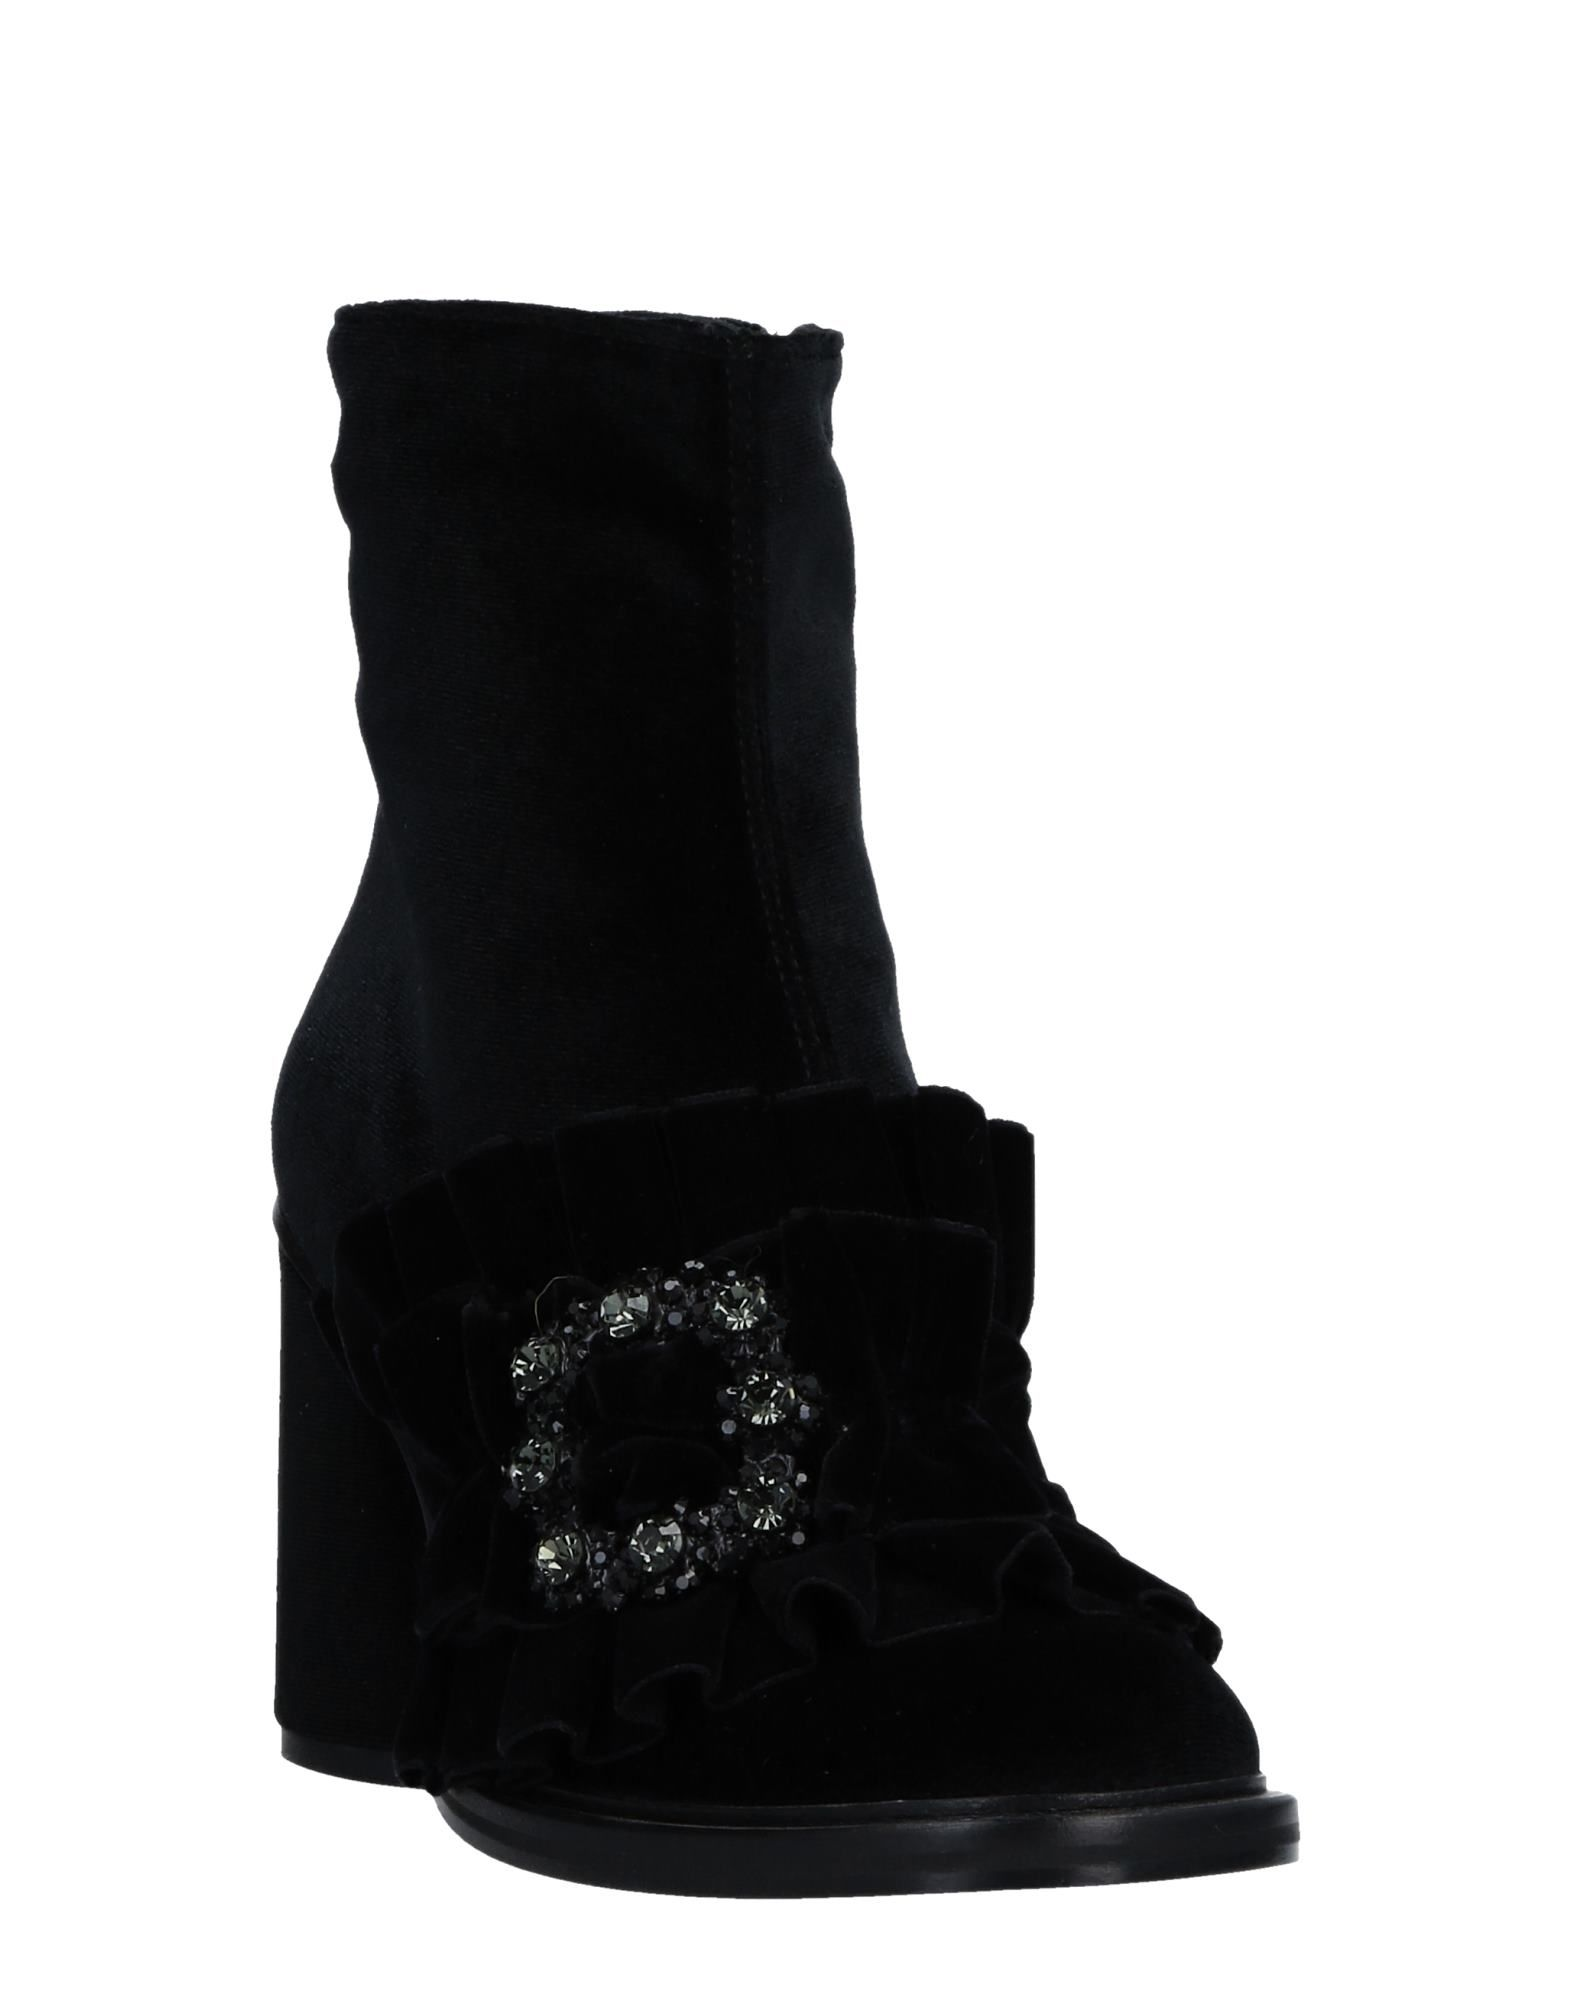 Tipe E Tacchi Stiefelette strapazierfähige Damen  11517009QVGut aussehende strapazierfähige Stiefelette Schuhe eca253